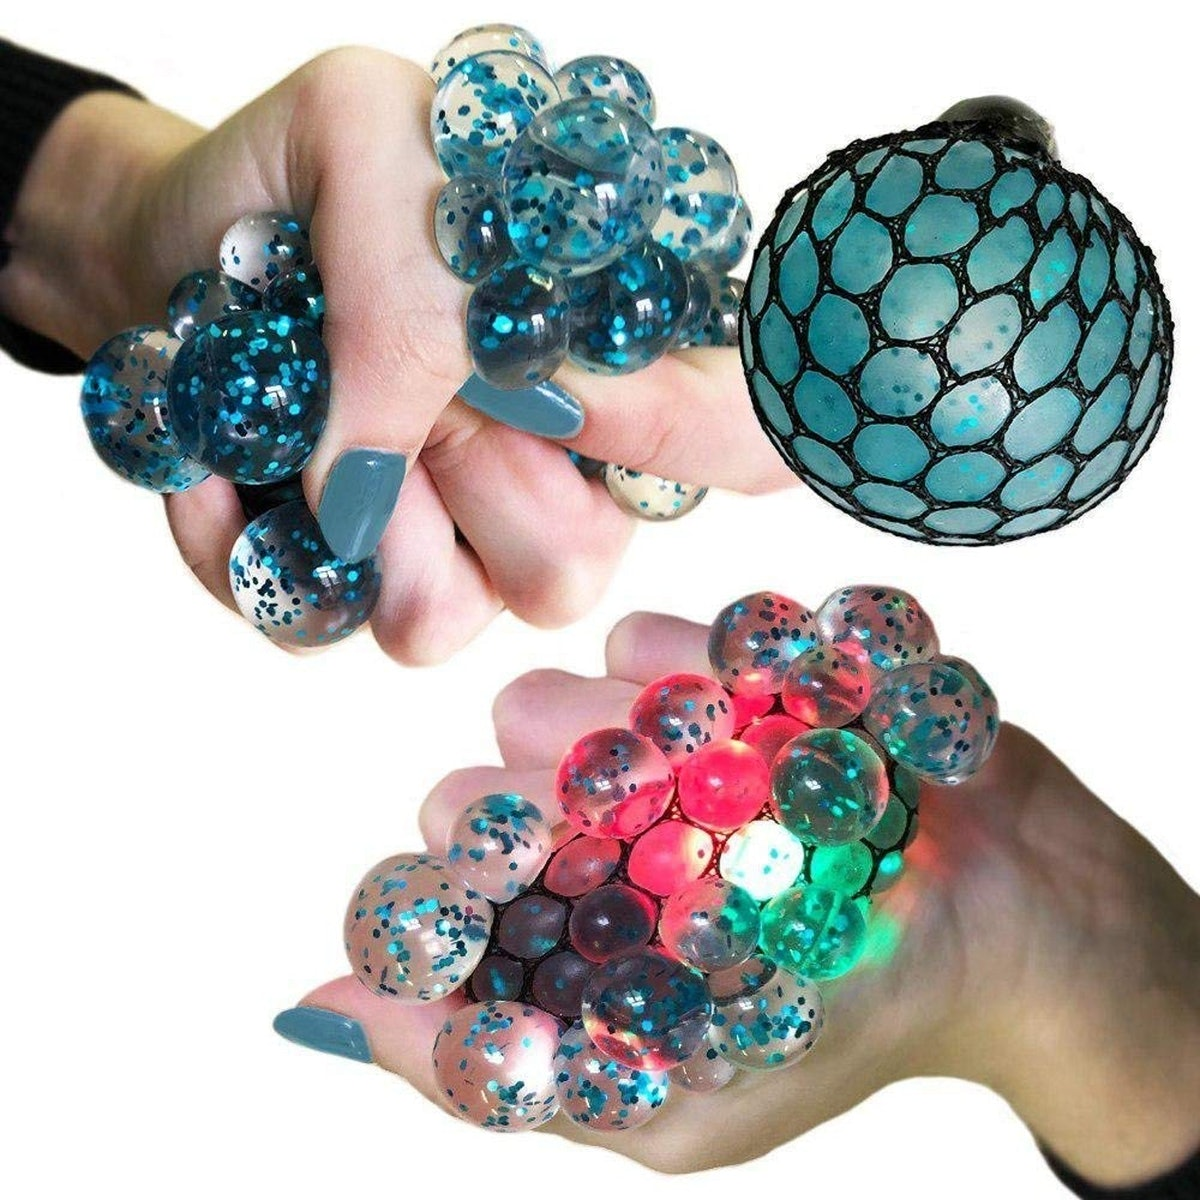 MorganProducts LED Stress Ball